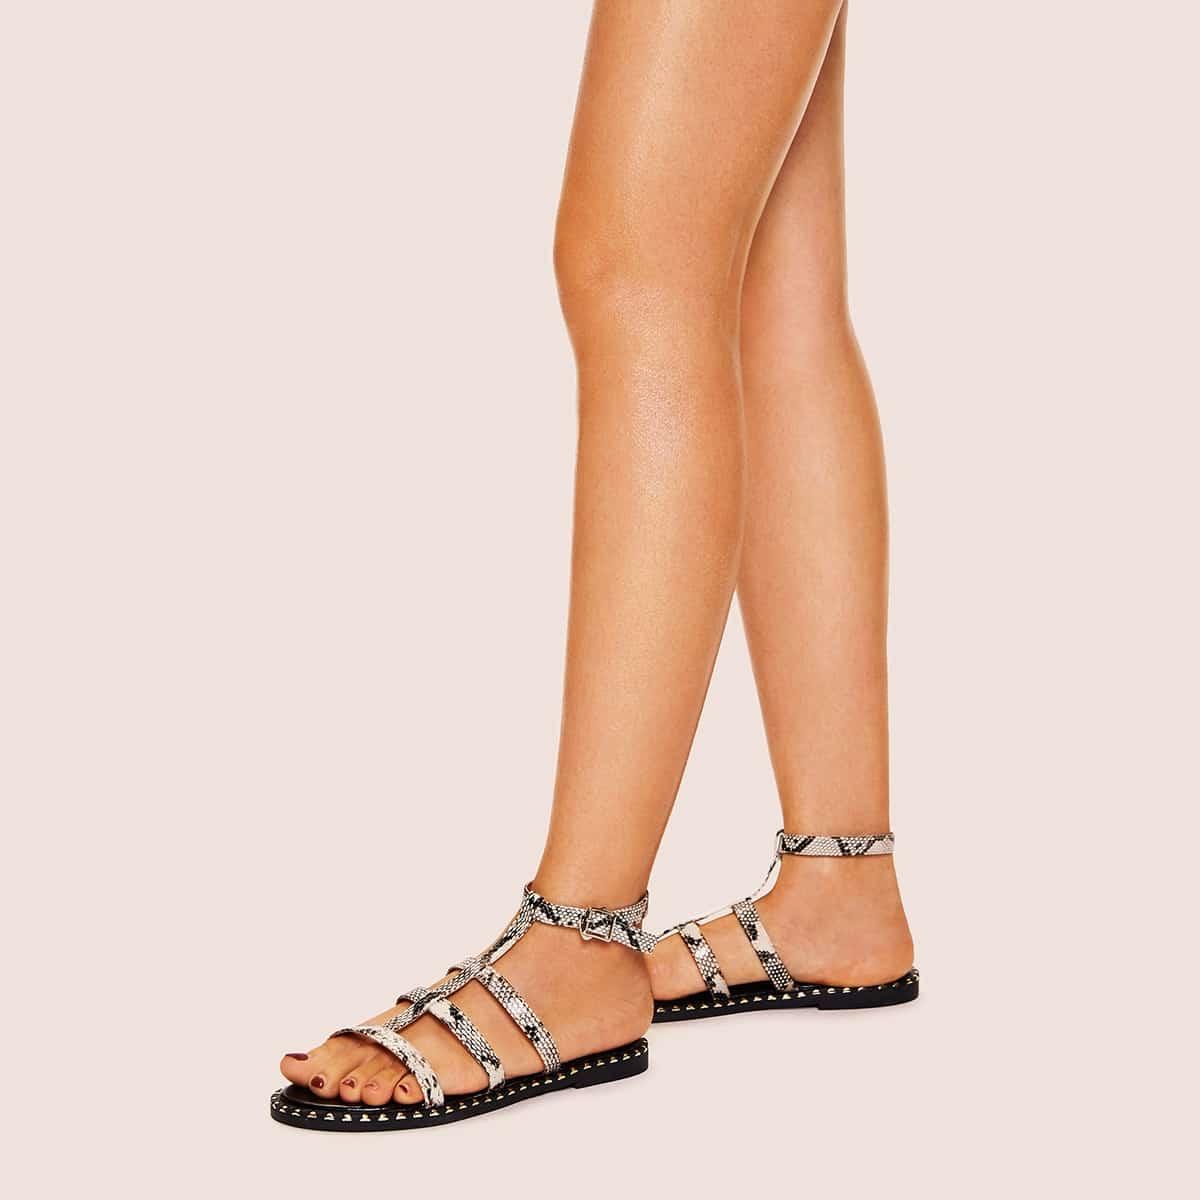 Snakeskin patroon uitgesneden platte sandalen